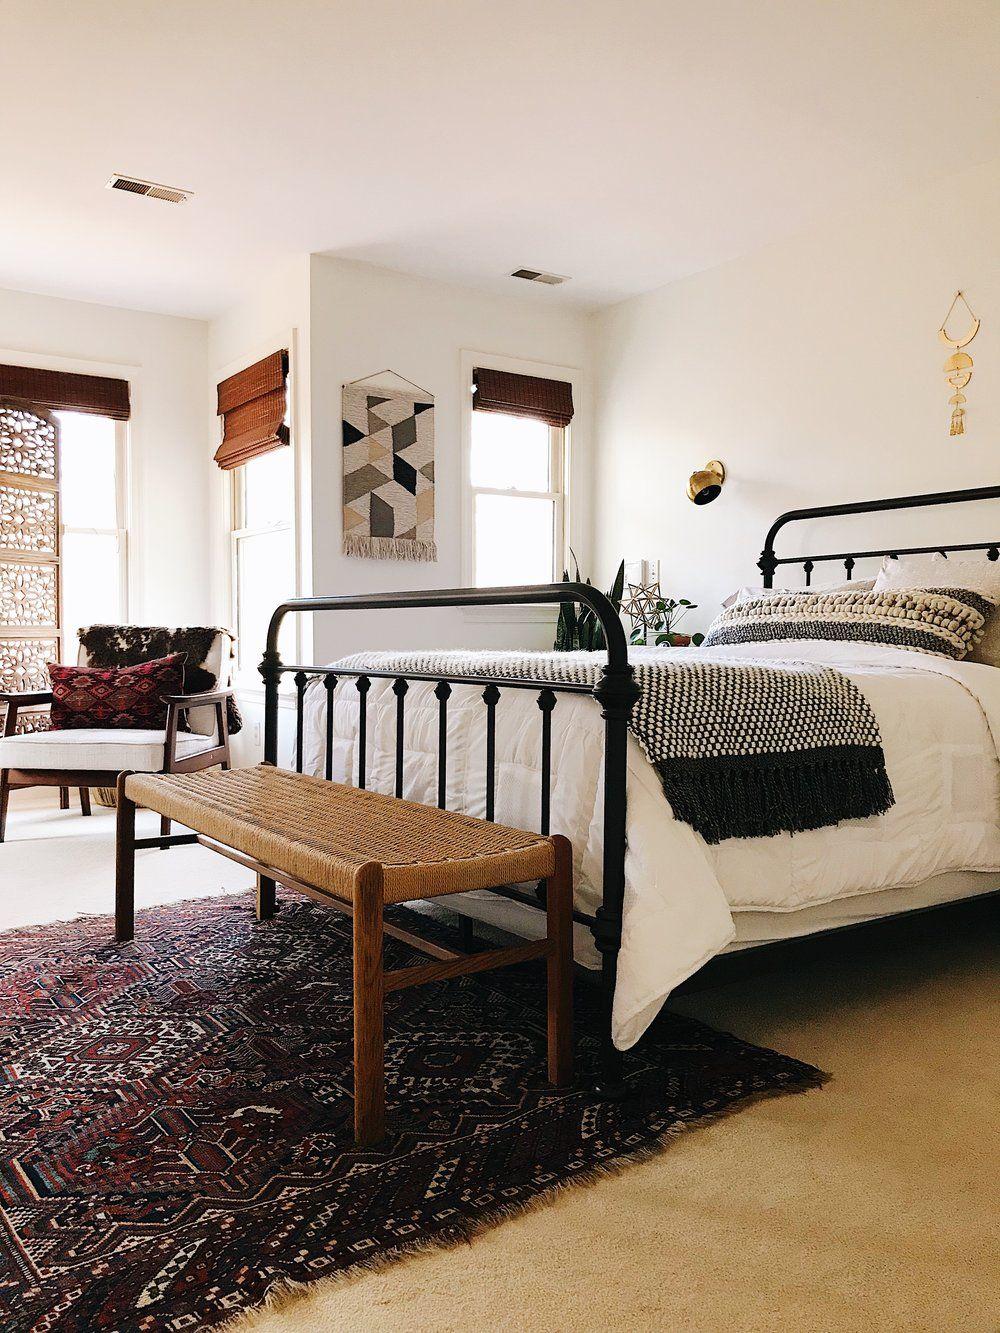 Boho Master Bedroom Ideas Boho Master Bedroom Woman Bedroom Bedroom Ideas Pinterest